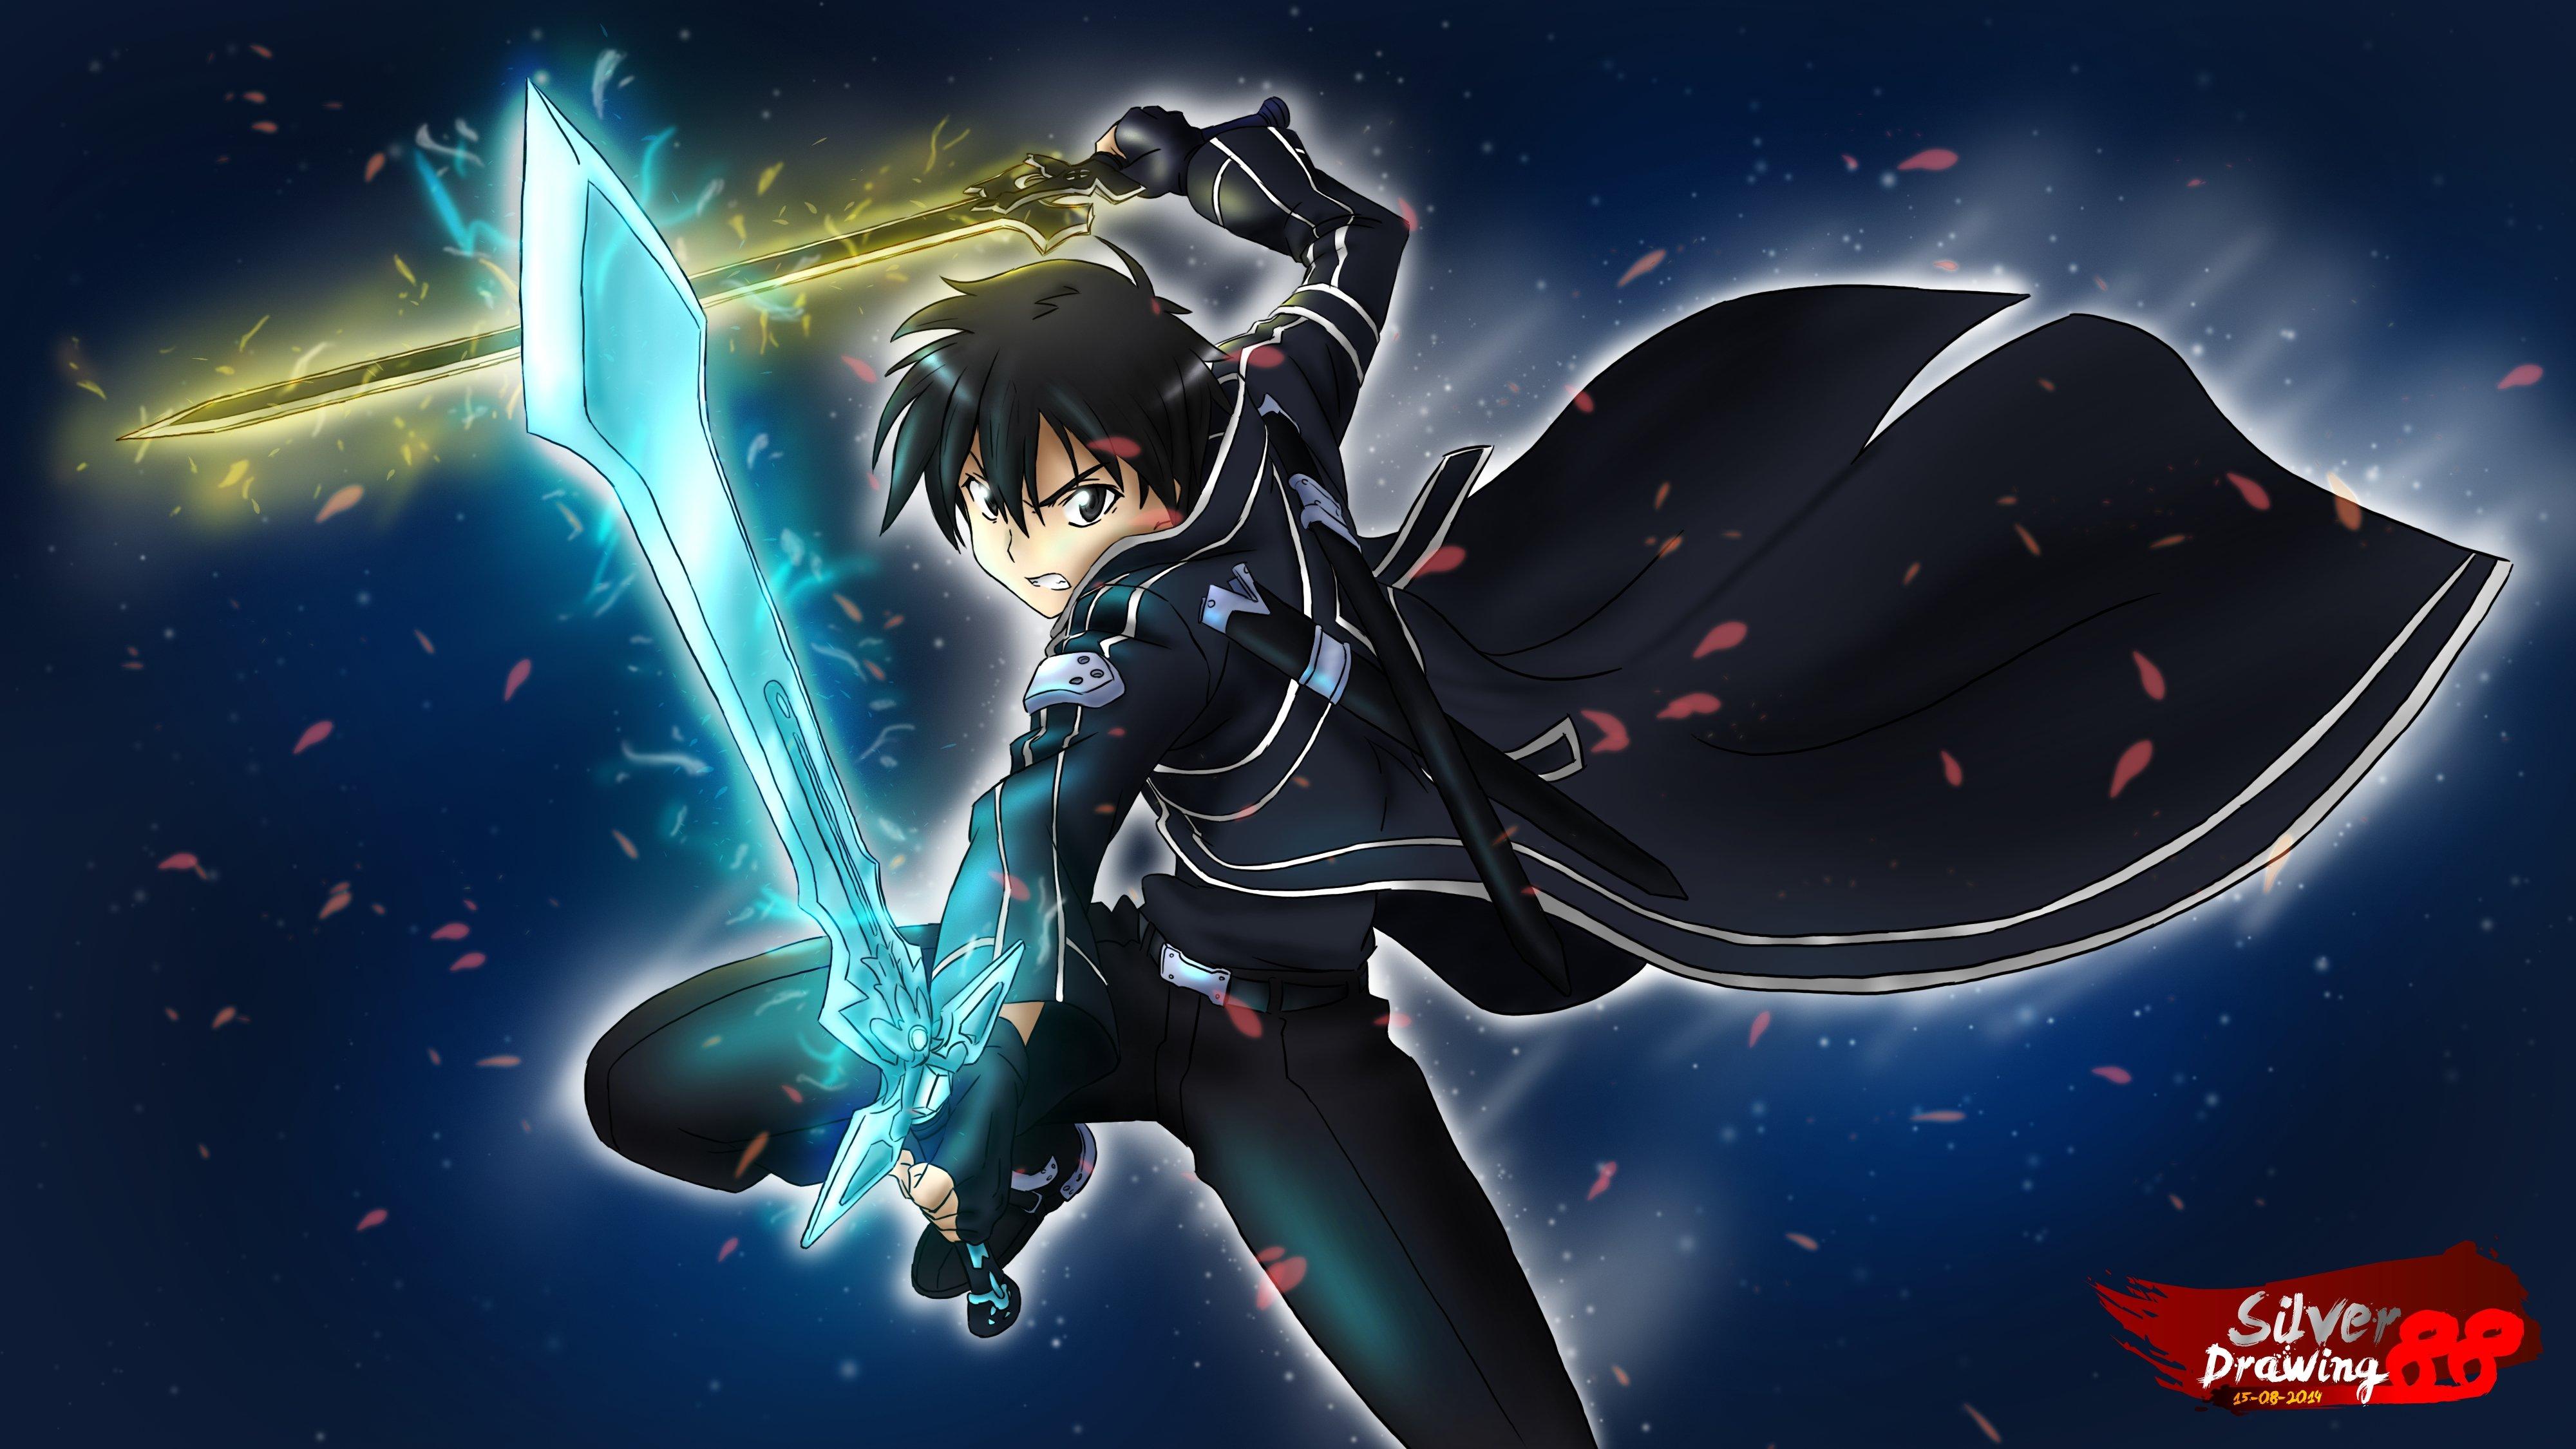 Kirito Sword Art Online Anime Wallpaper Id 3075